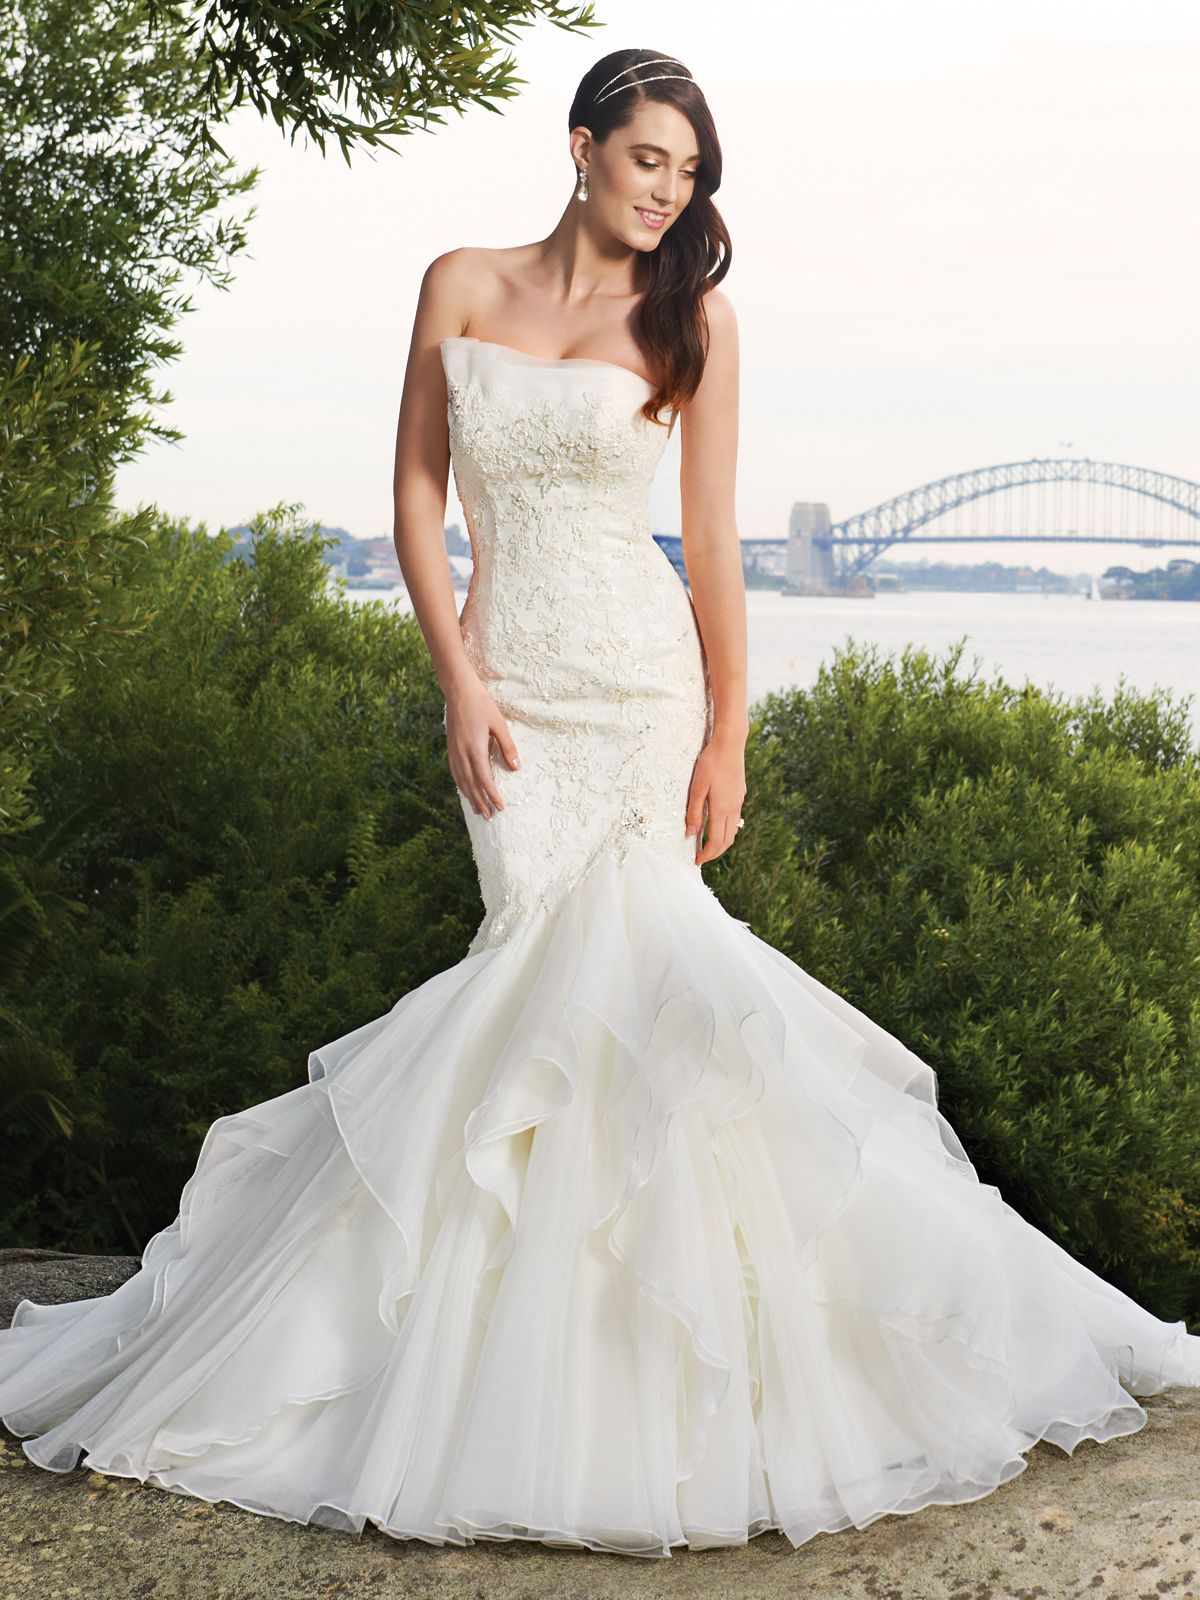 Vestidos de novia para verano 2013 Sophia Tolli | Boda Hoy ...